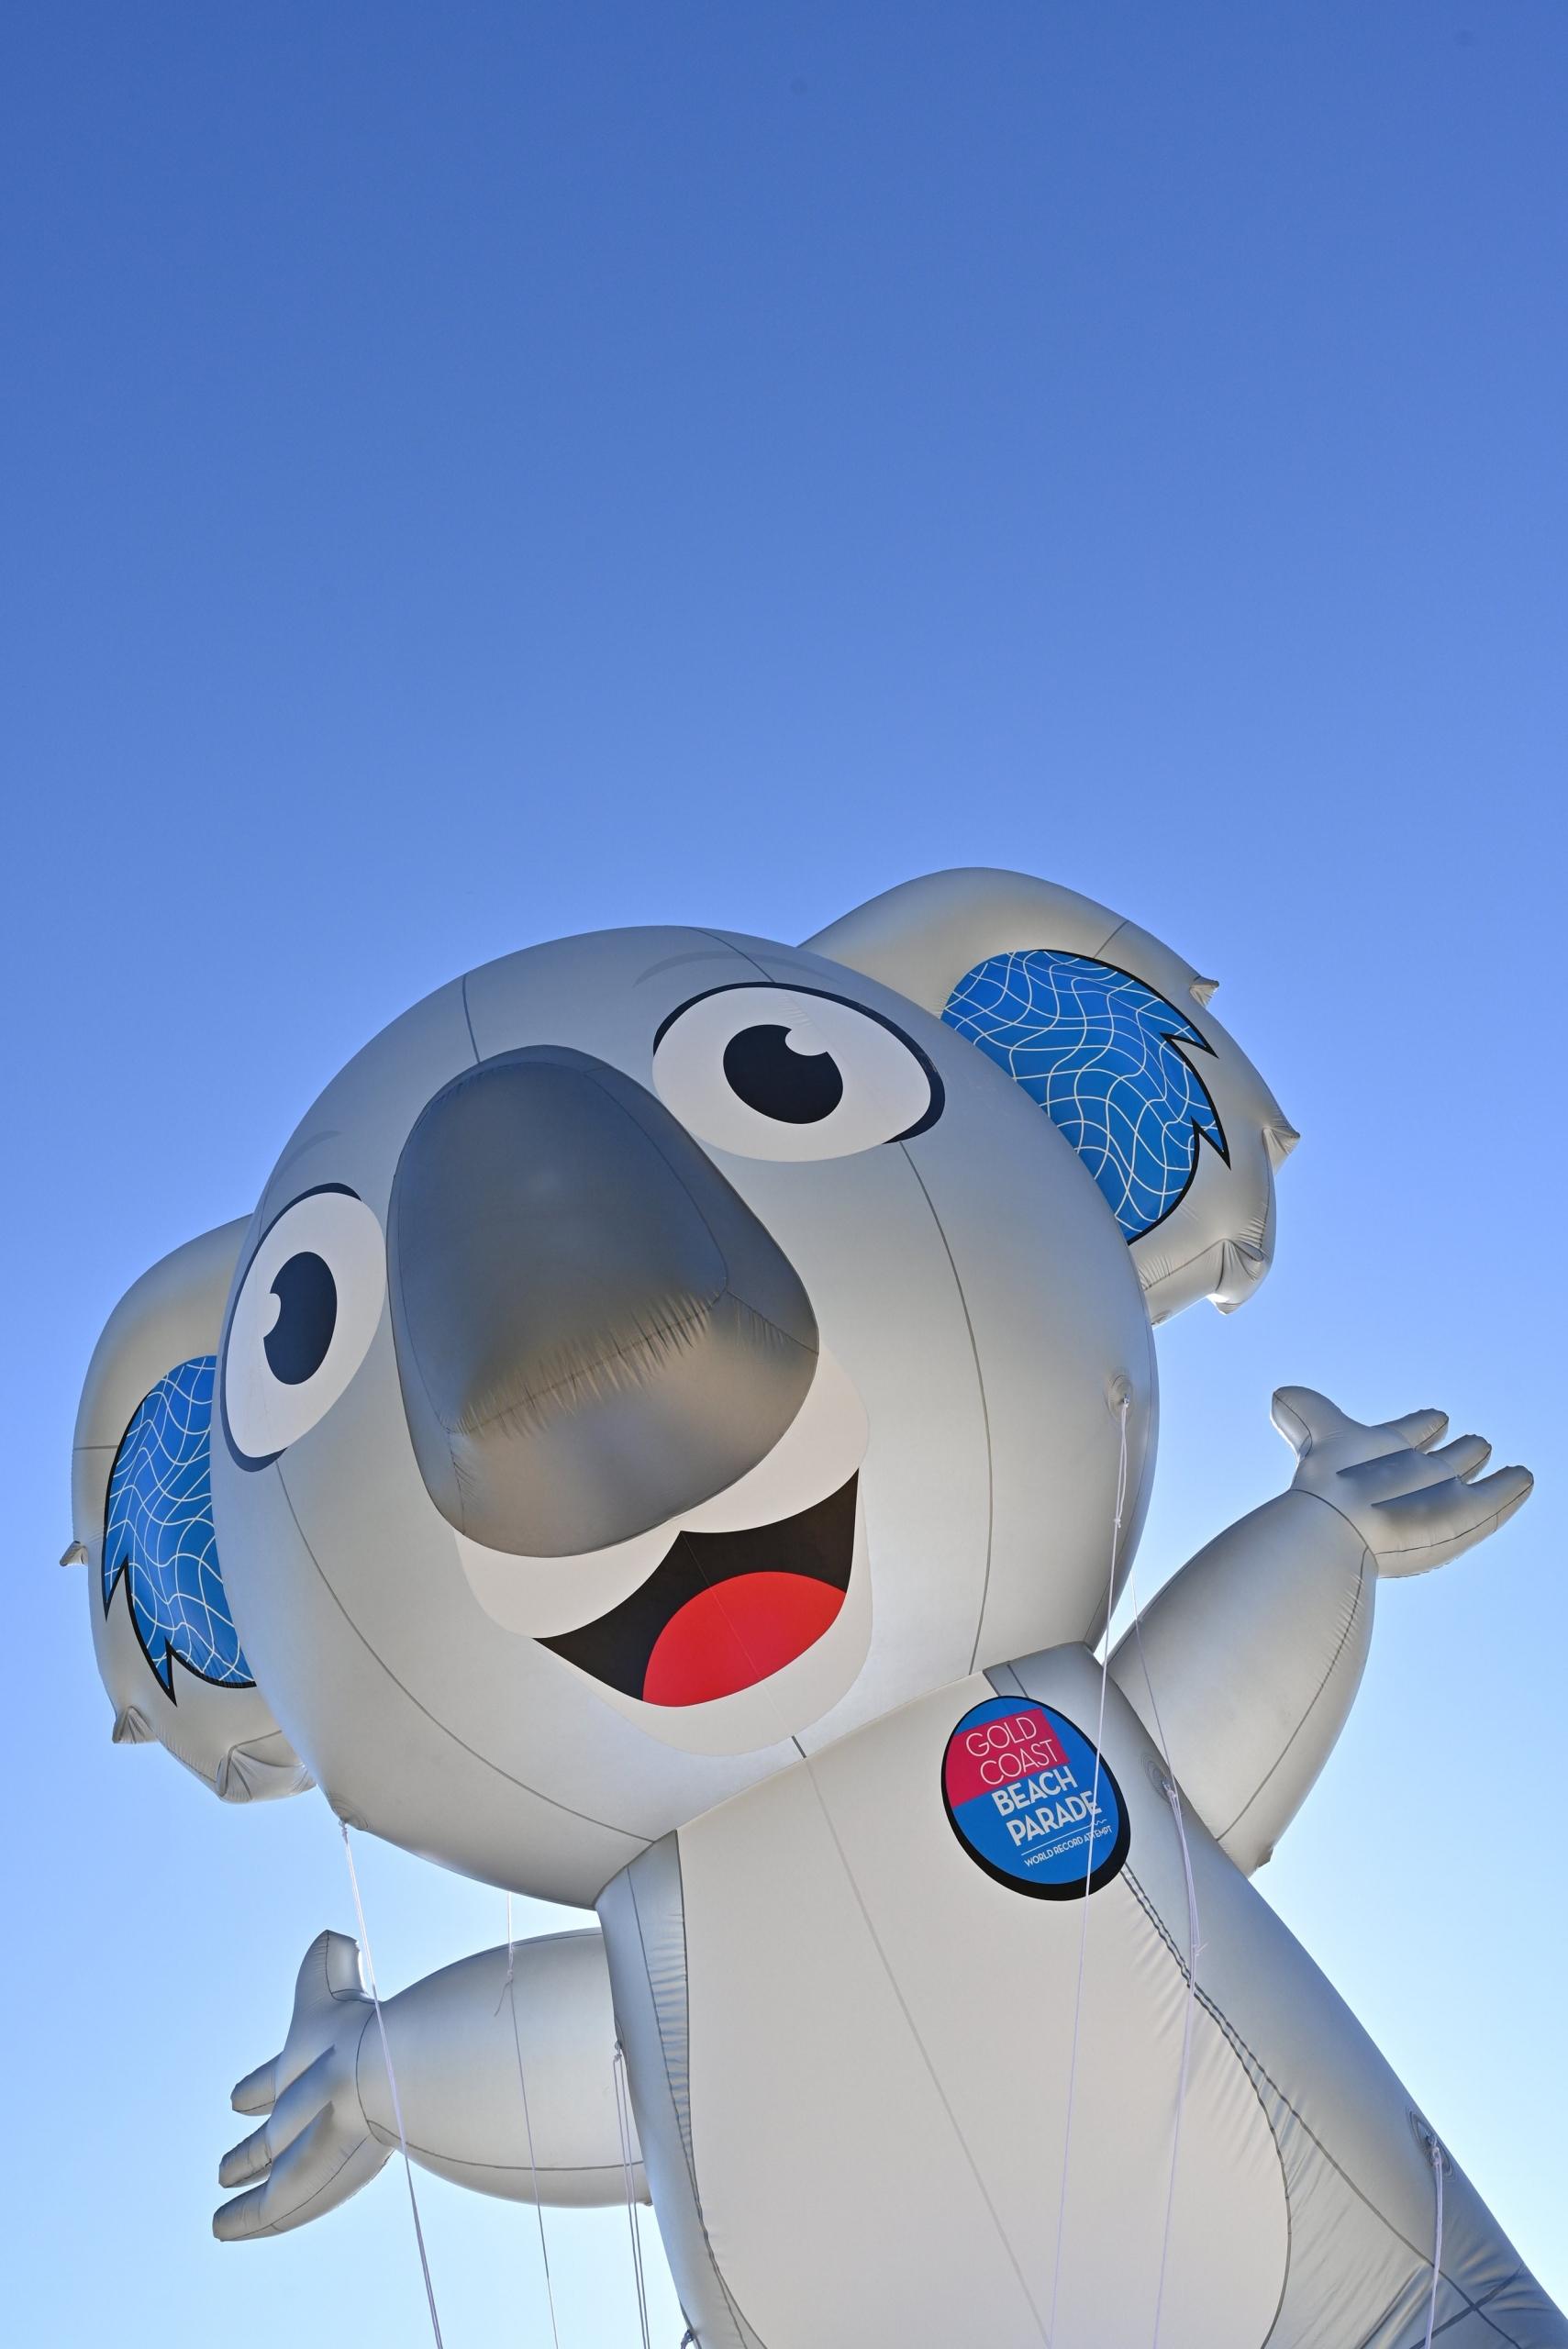 Gold Coast Beach Parade unveils mascot 'Burleigh'